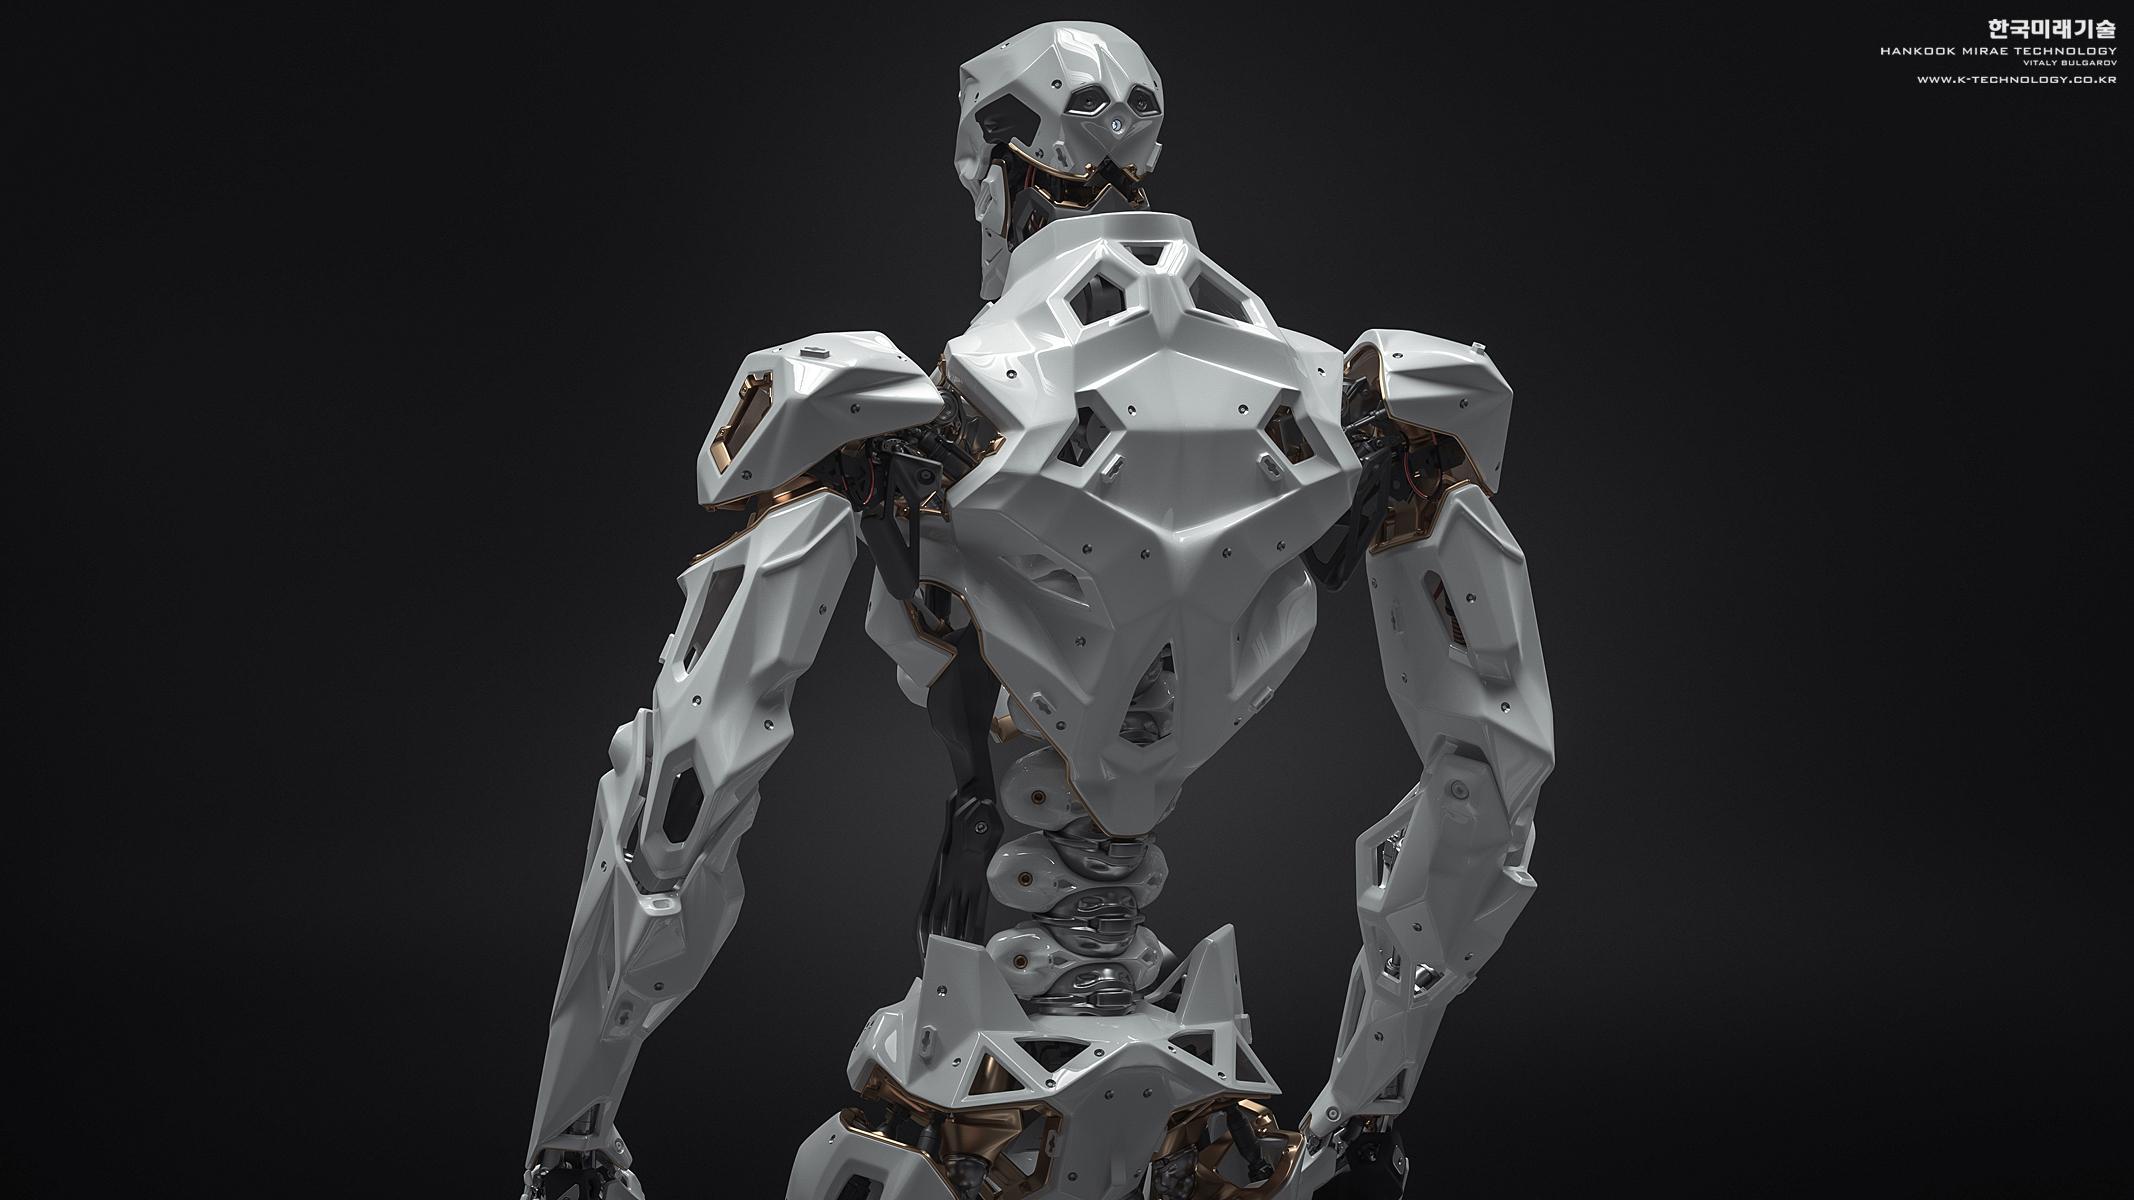 KFT_2.Xm_RobotDesign_ (11 of 29).jpg